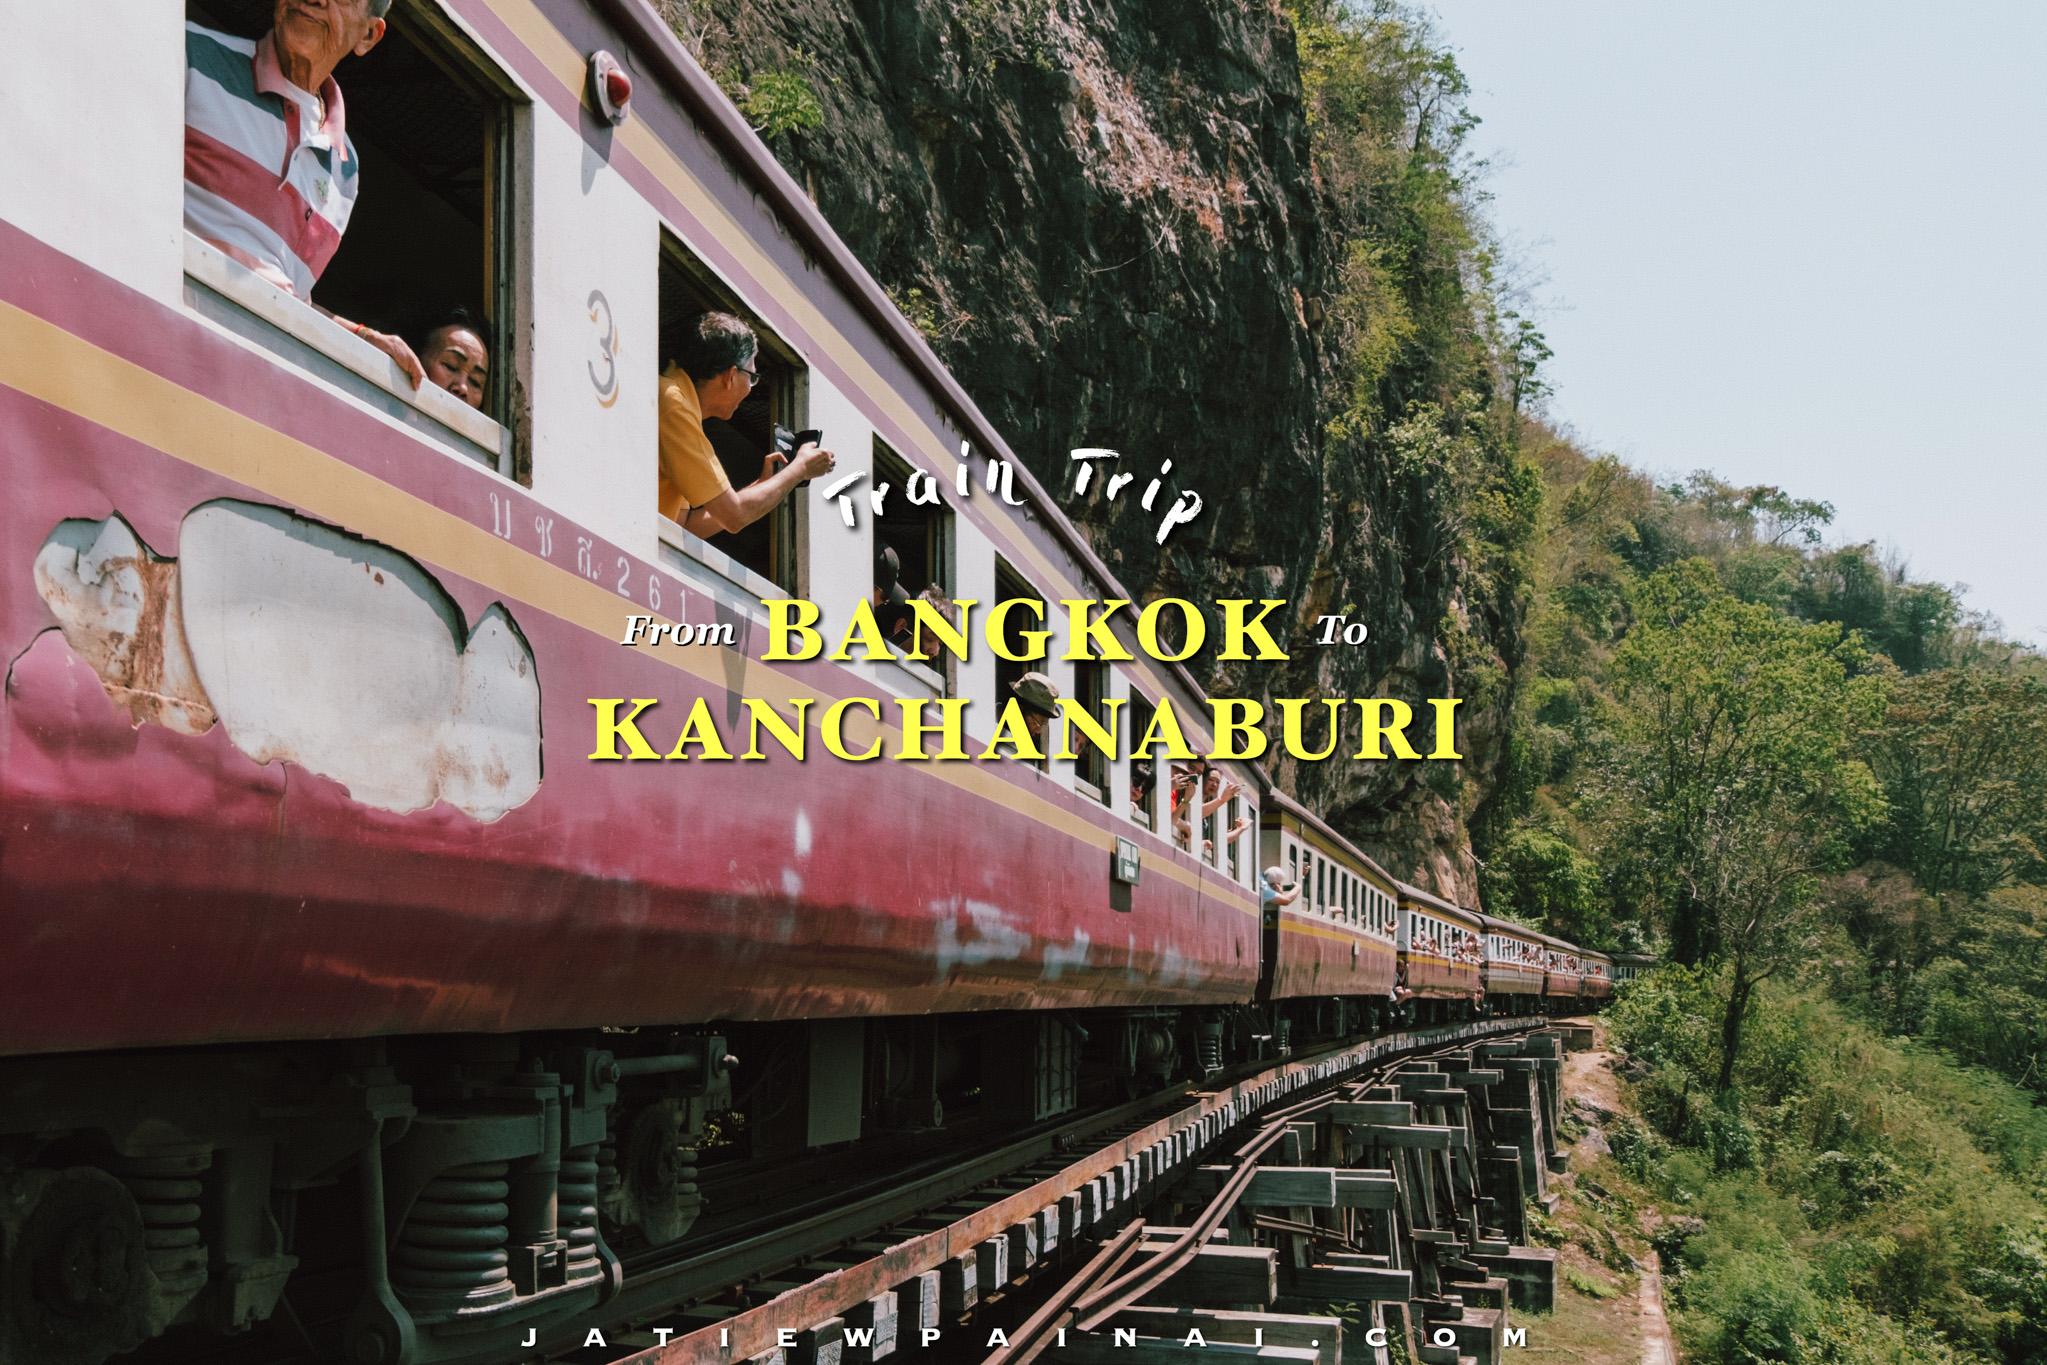 Train Trip :: from Bangkok to Kanchanaburi :: นั่งรถไฟไป